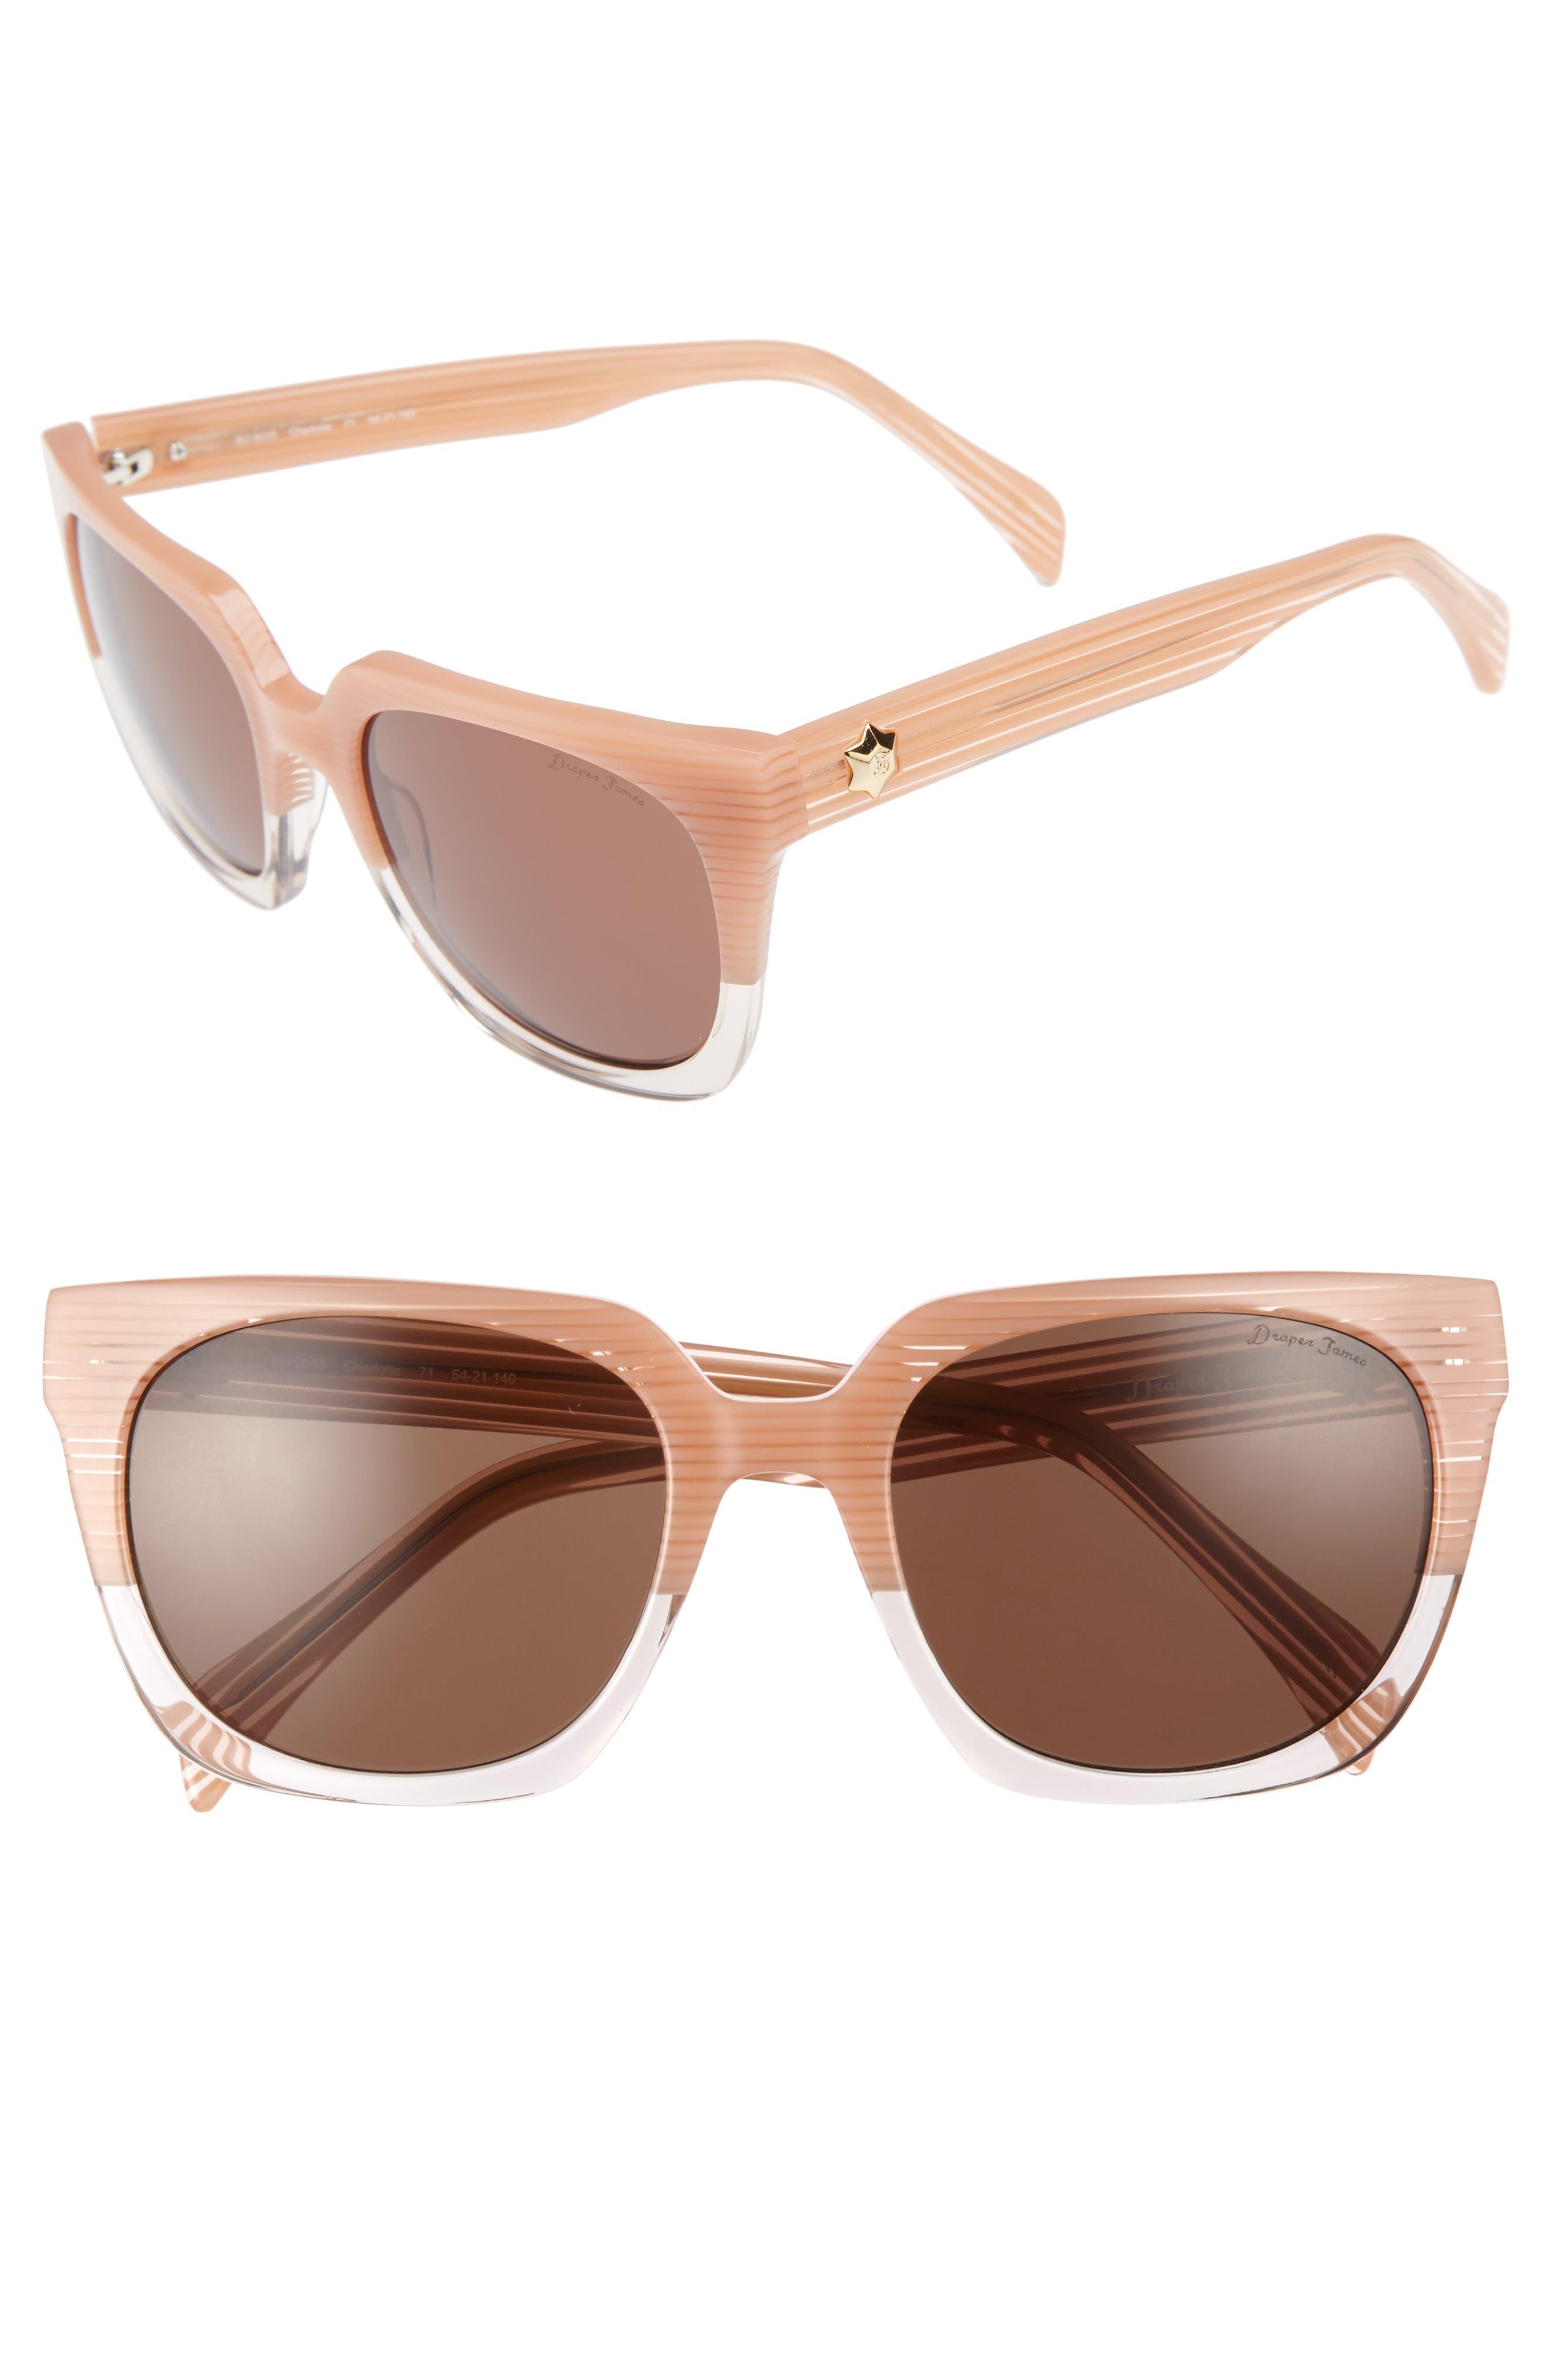 Main Image - Draper James 54mm Square Sunglasses